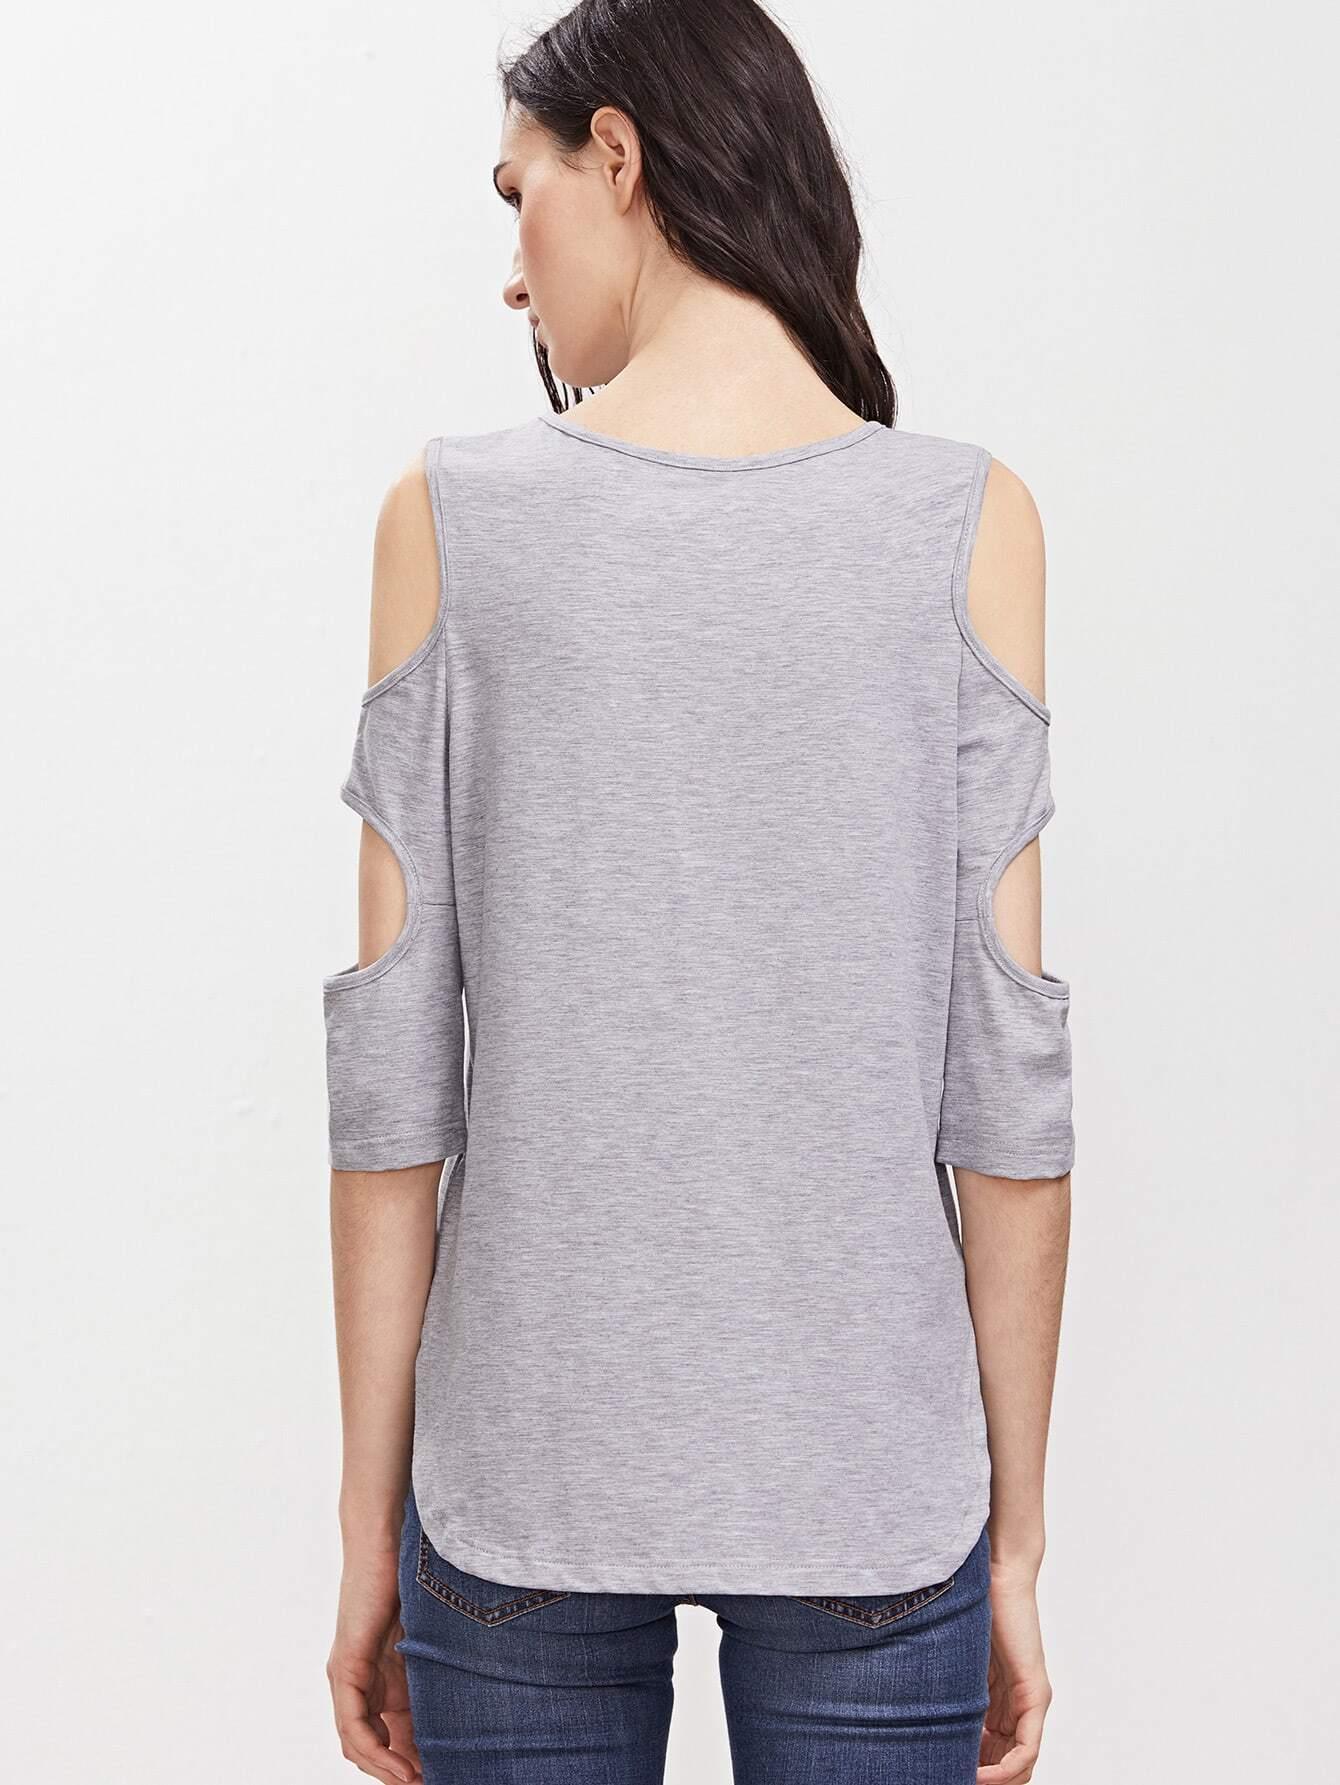 Cutout 3 4 sleeve t shirt shein sheinside for 3 4 sleeve shirt template